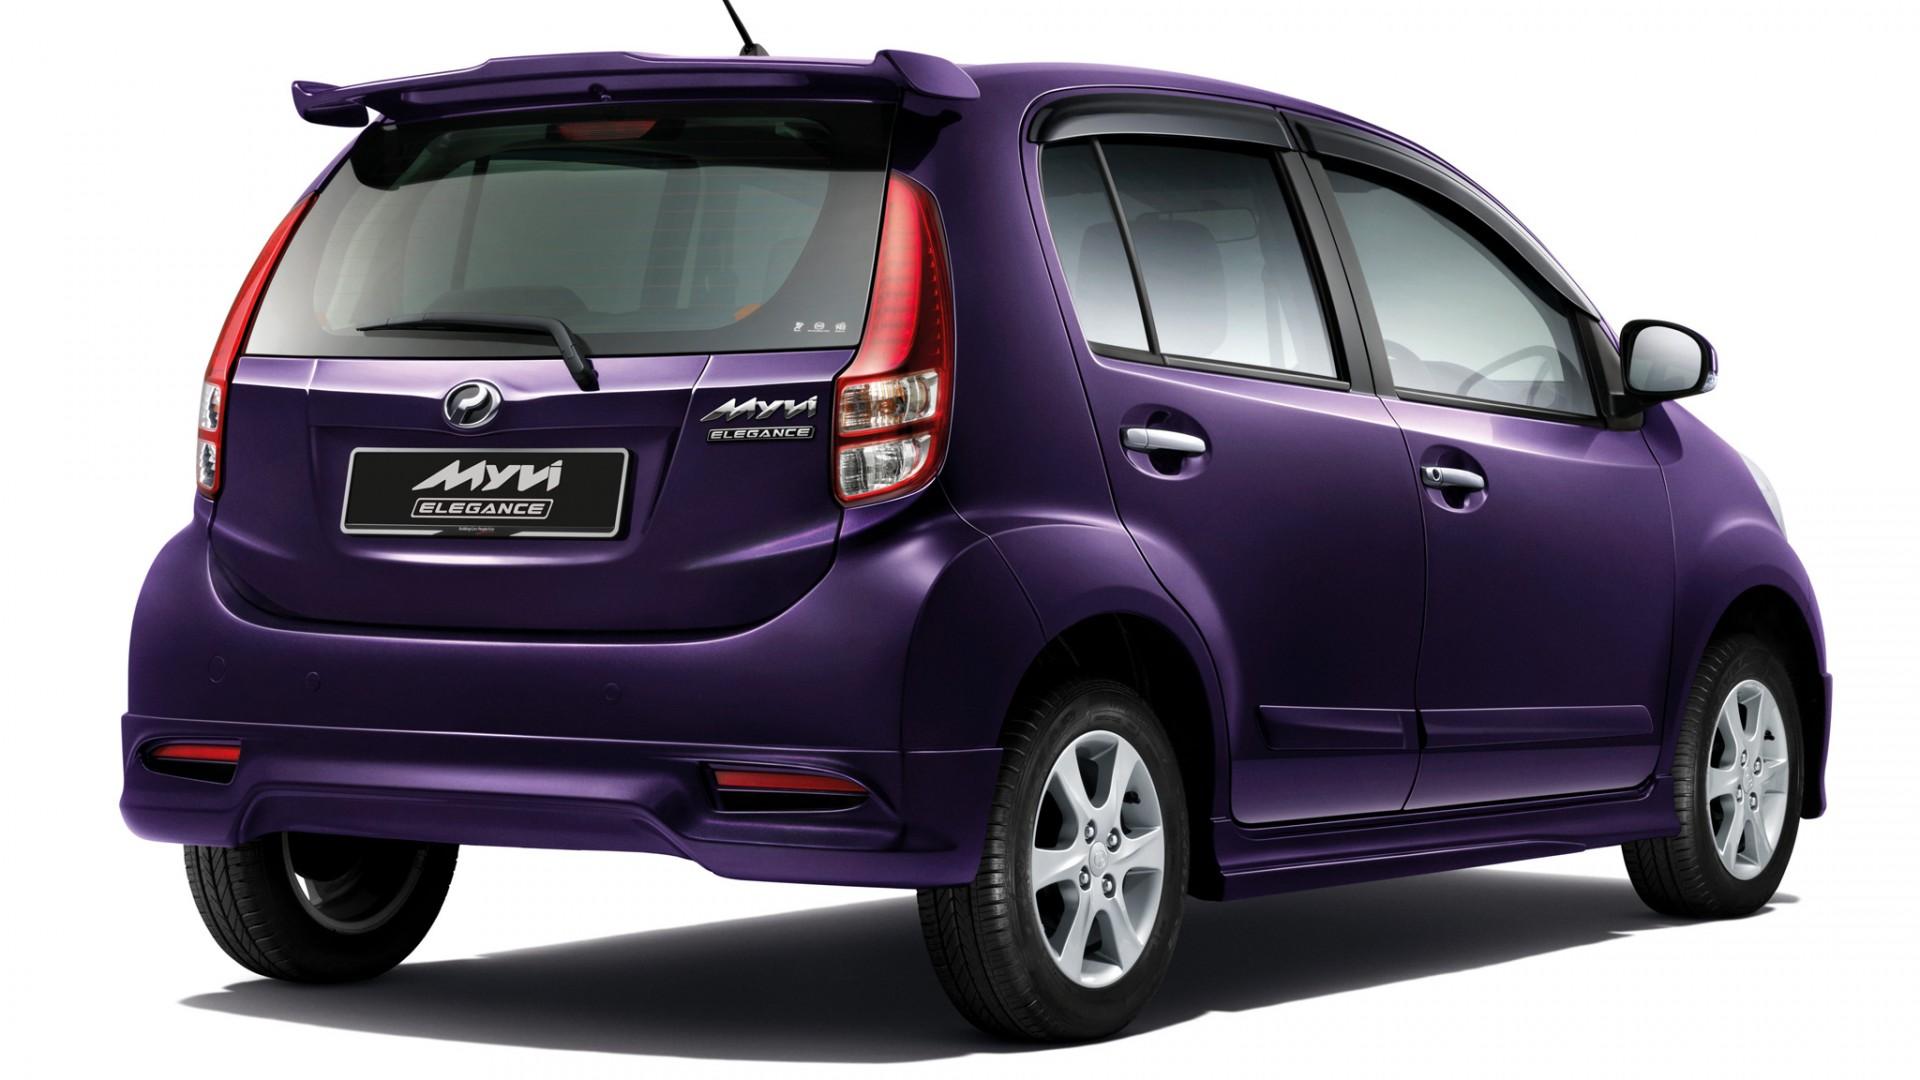 2011 Perodua MyVi Elegance Rear Angle   Car  free download HD Wallpaper